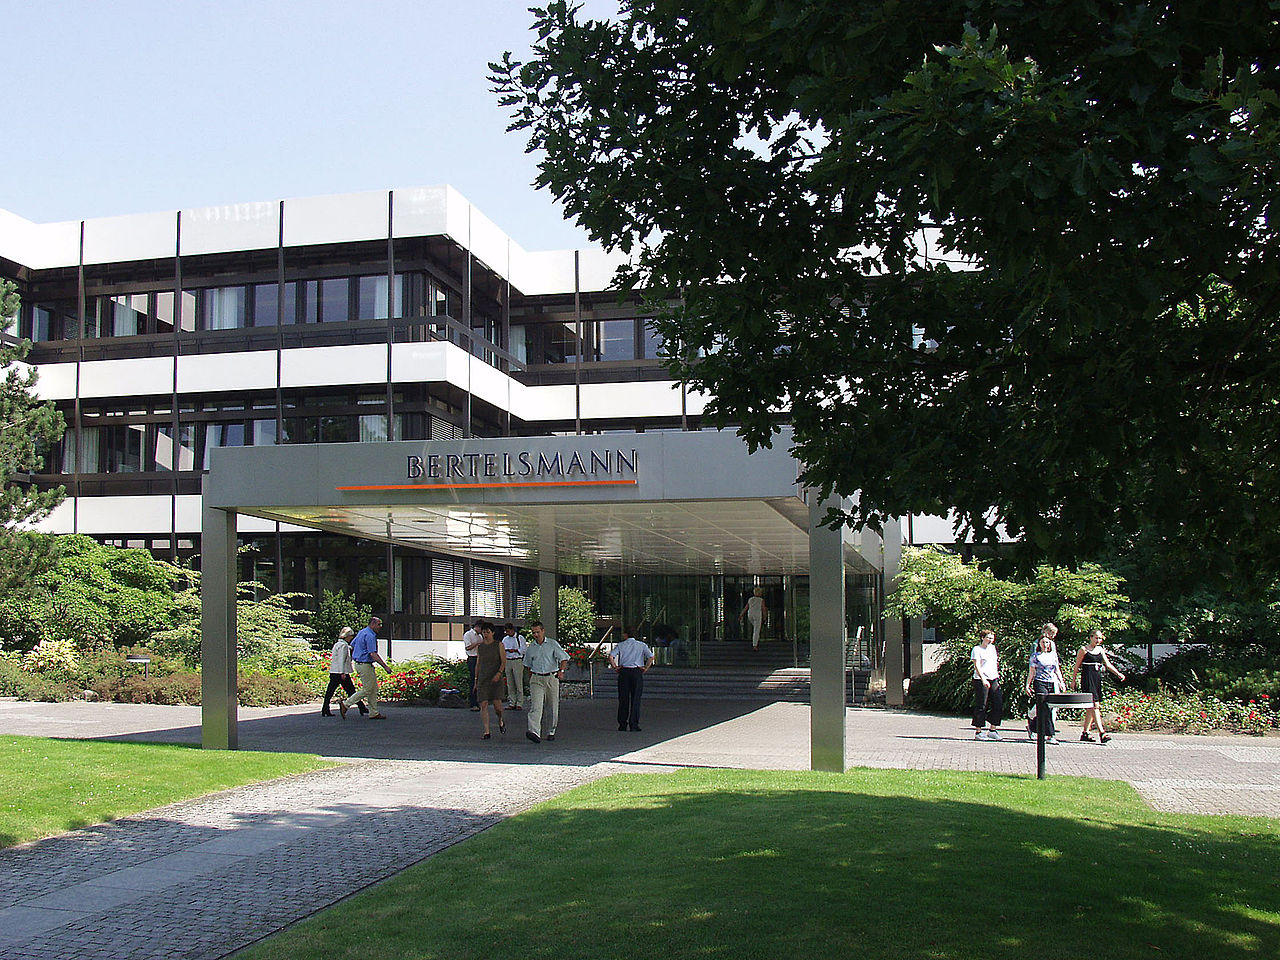 Bertelsmann Building.JPG